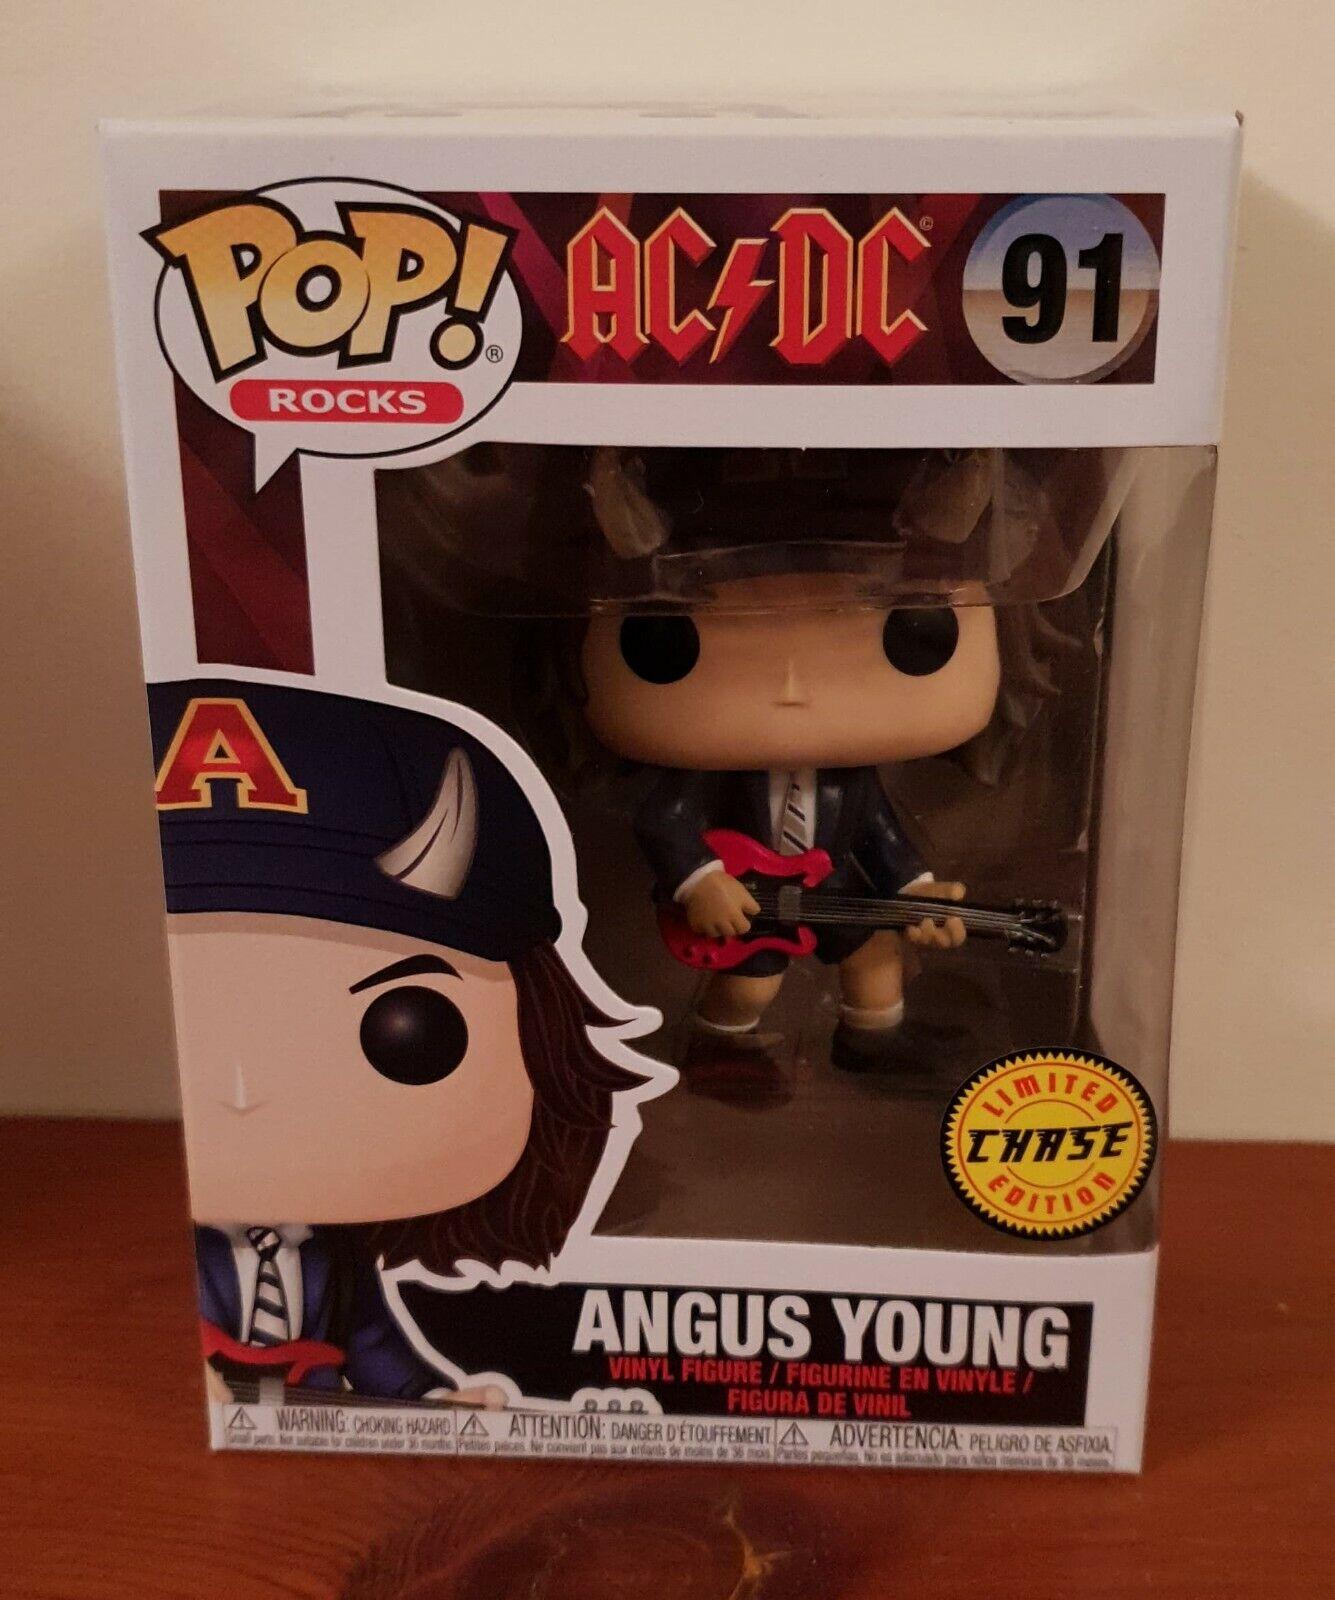 RARE POP FUNKO AC DC ANGUS YOUNG CHASE LTD ED HORNS VINYL FIGURE 91 FREE CASE